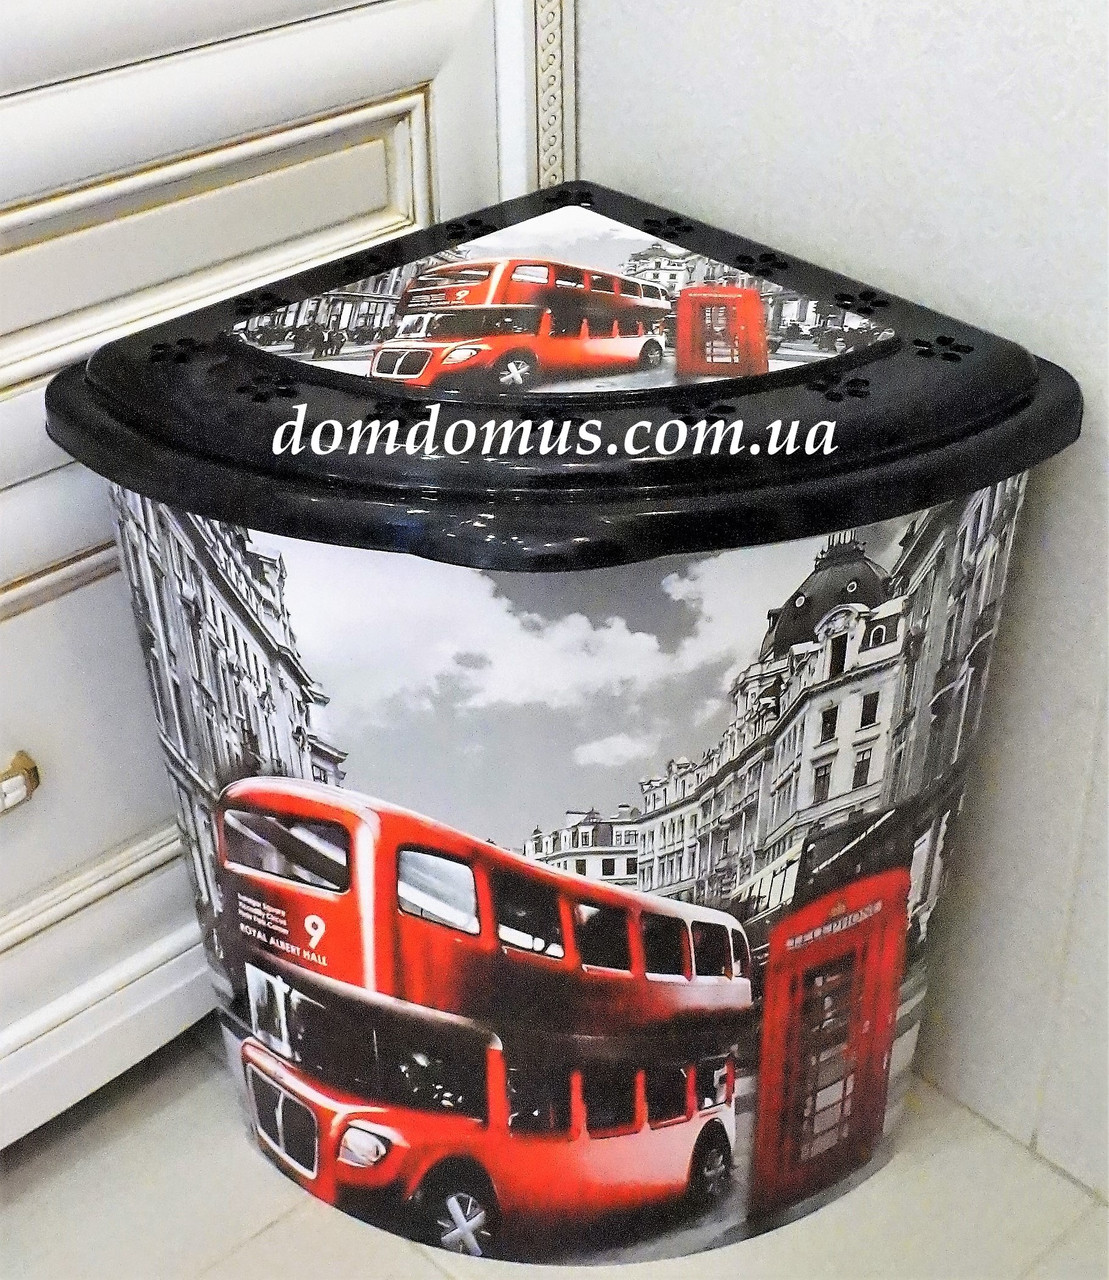 "Корзина для белья угловая ""London"" 53 л  Elif Plastik, Турция"